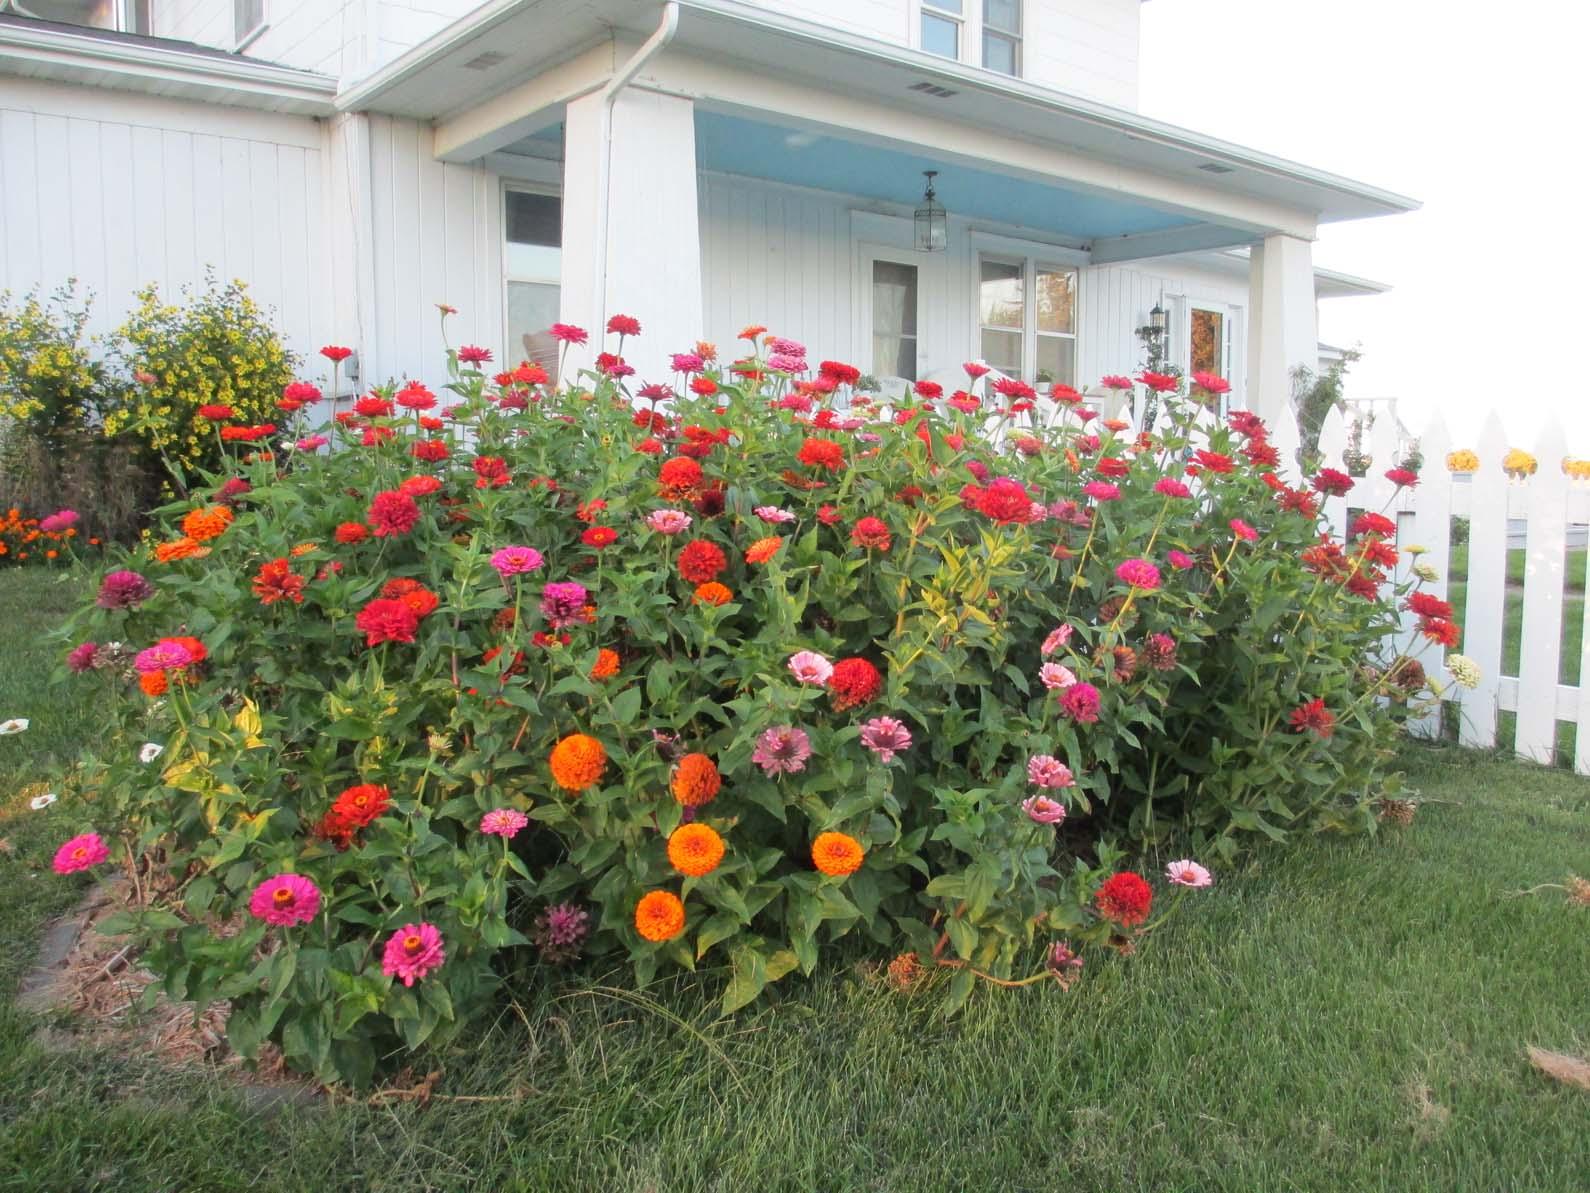 Garden fancy a late summer ode to annuals a late summer ode to annuals izmirmasajfo